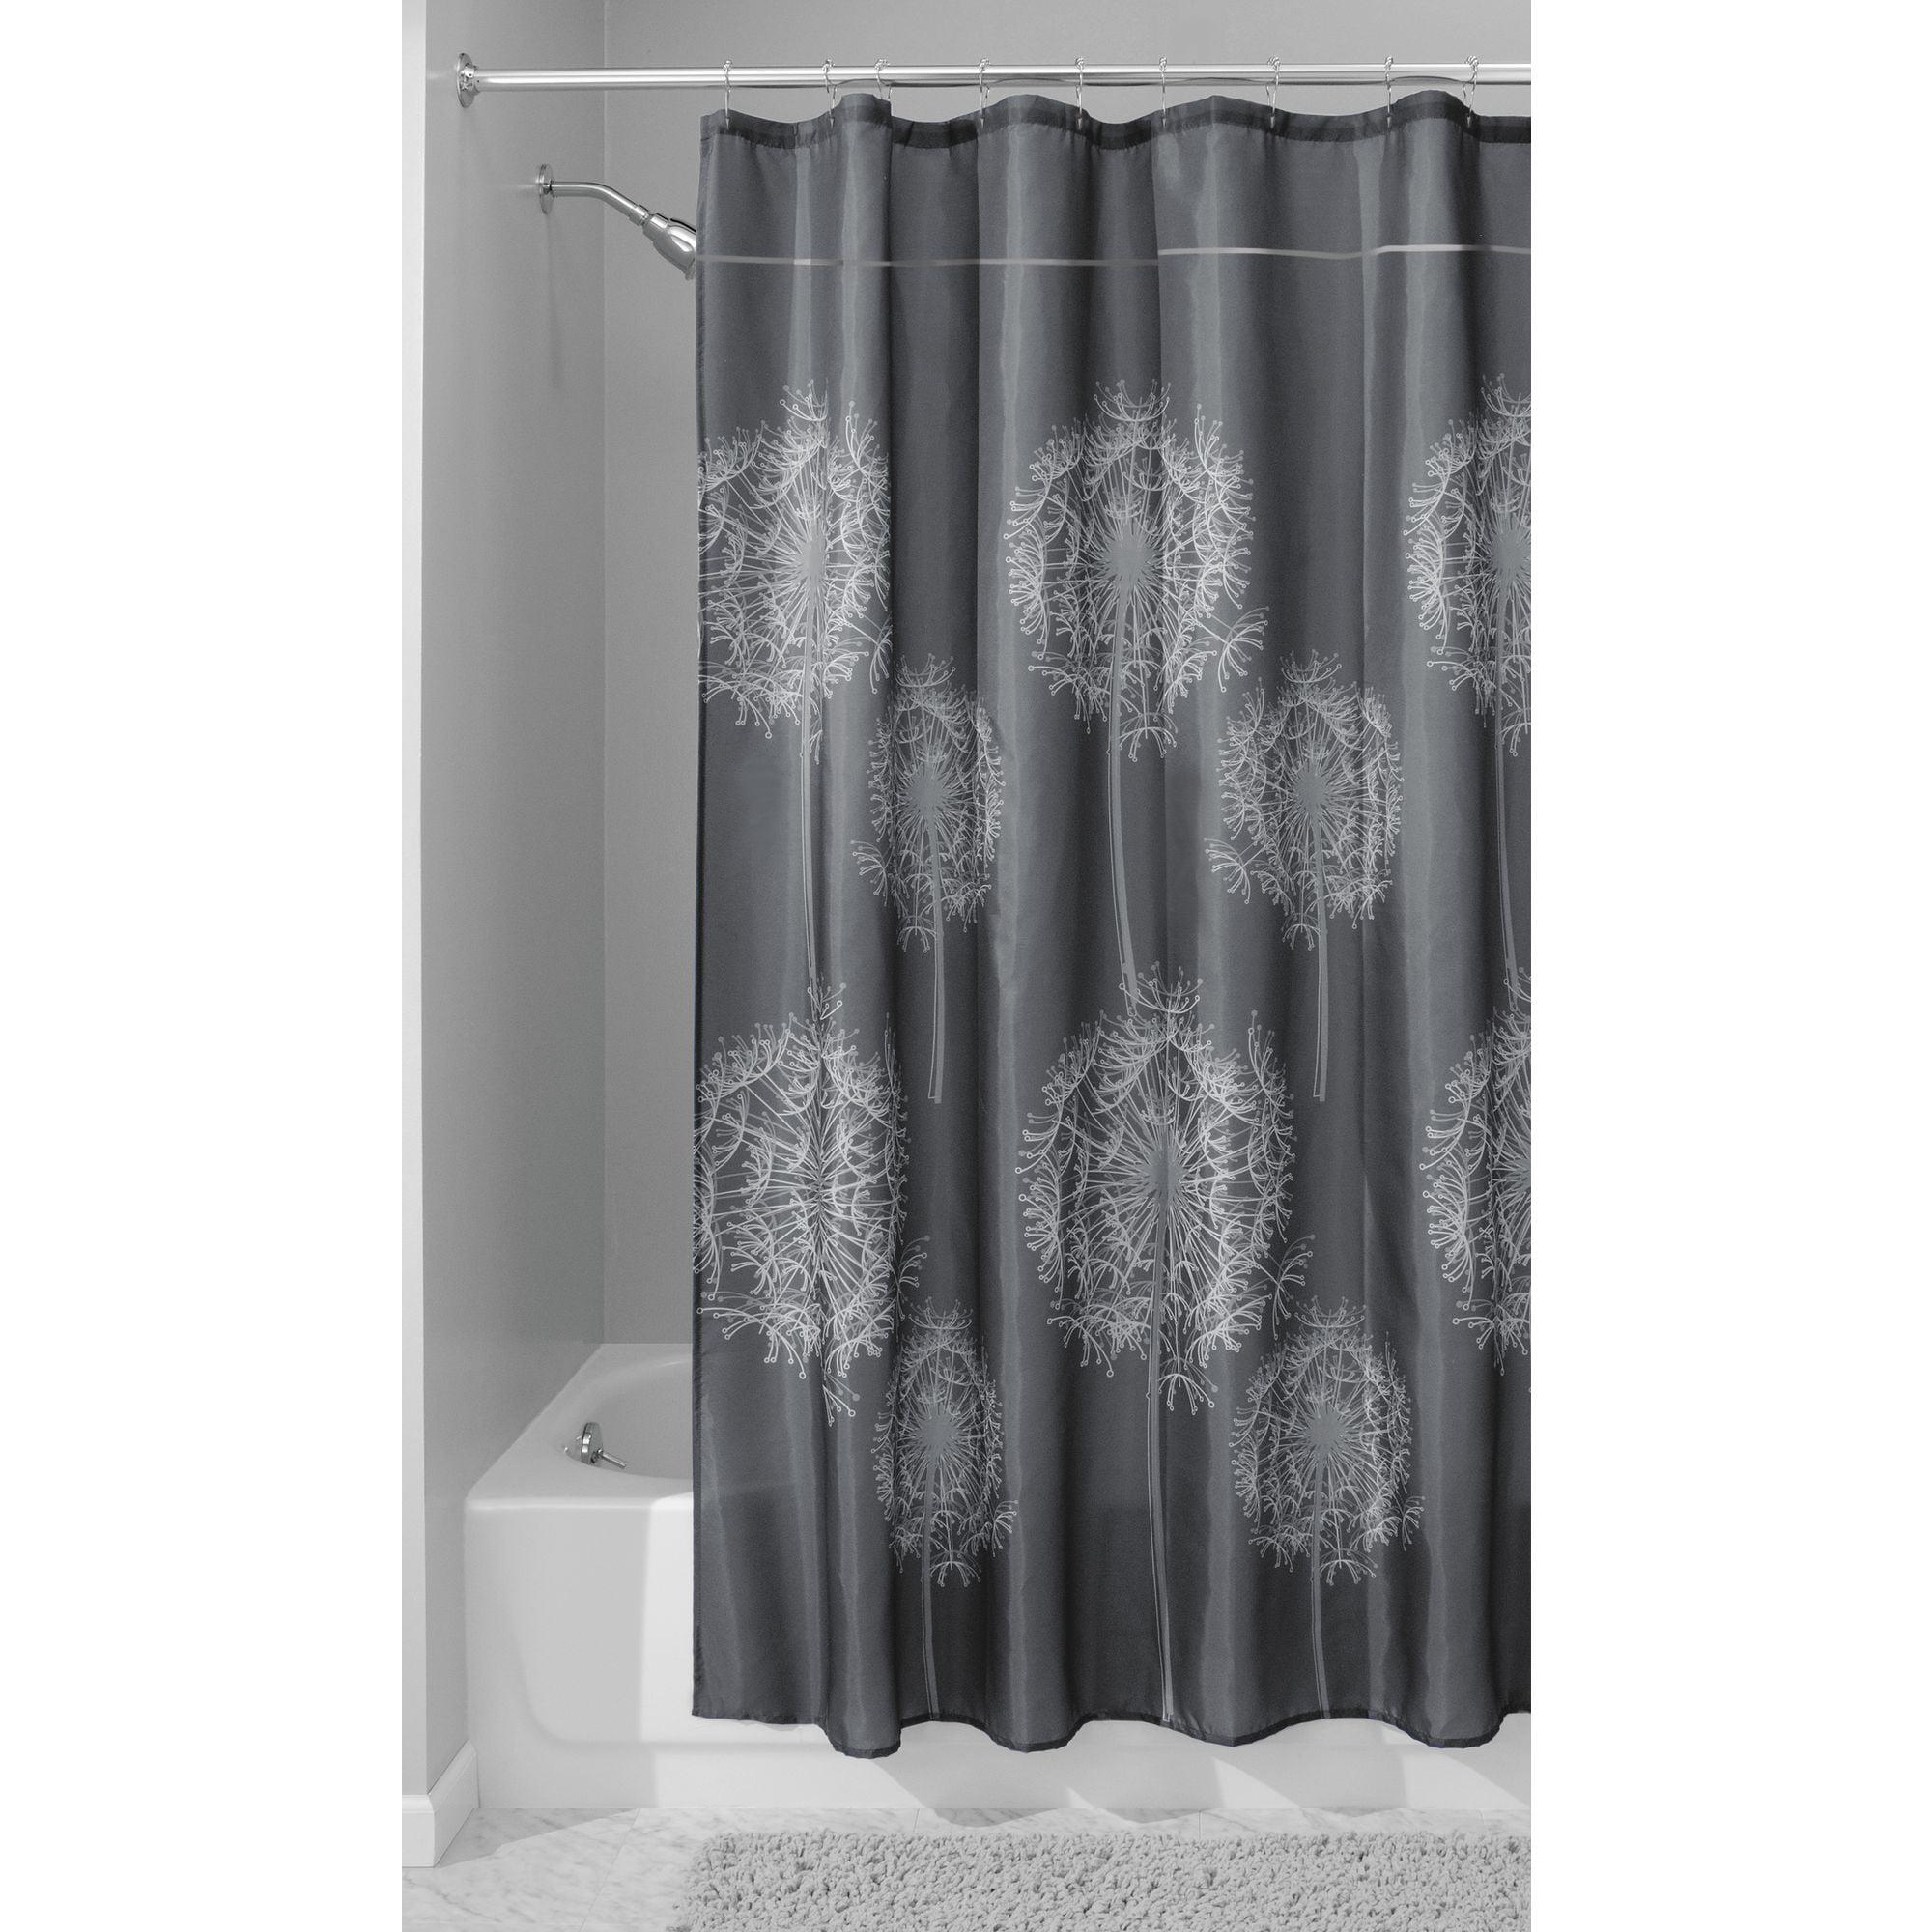 InterDesign Dandelion Fabric Shower Curtain, Various Sizes & Colors by INTERDESIGN